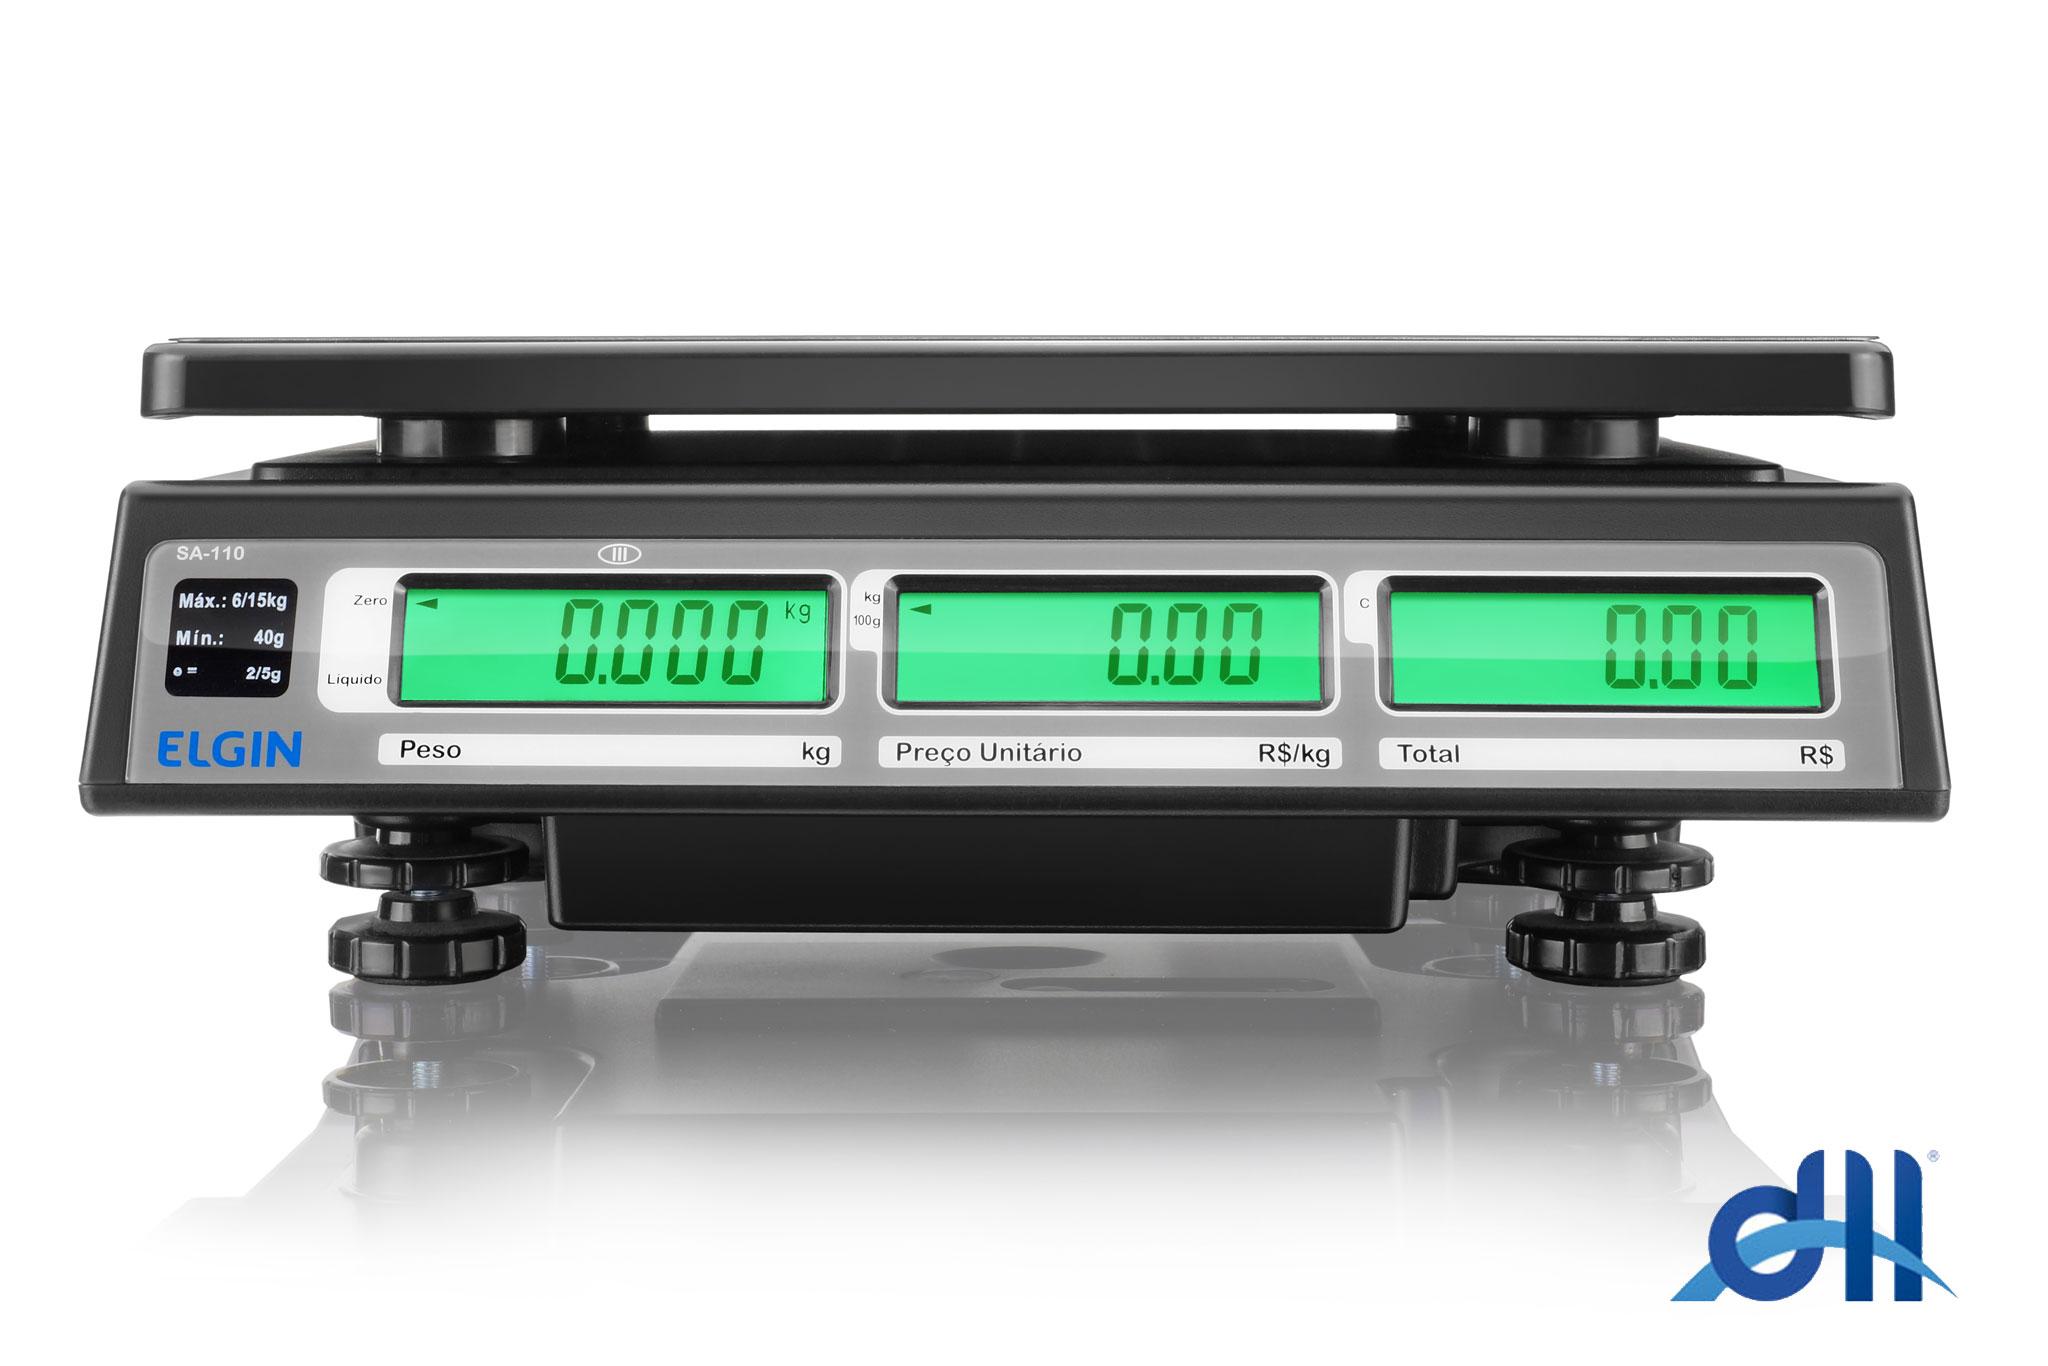 Balanca-de-Bancada-SA-110-com-Bateria-Elgin-traseira